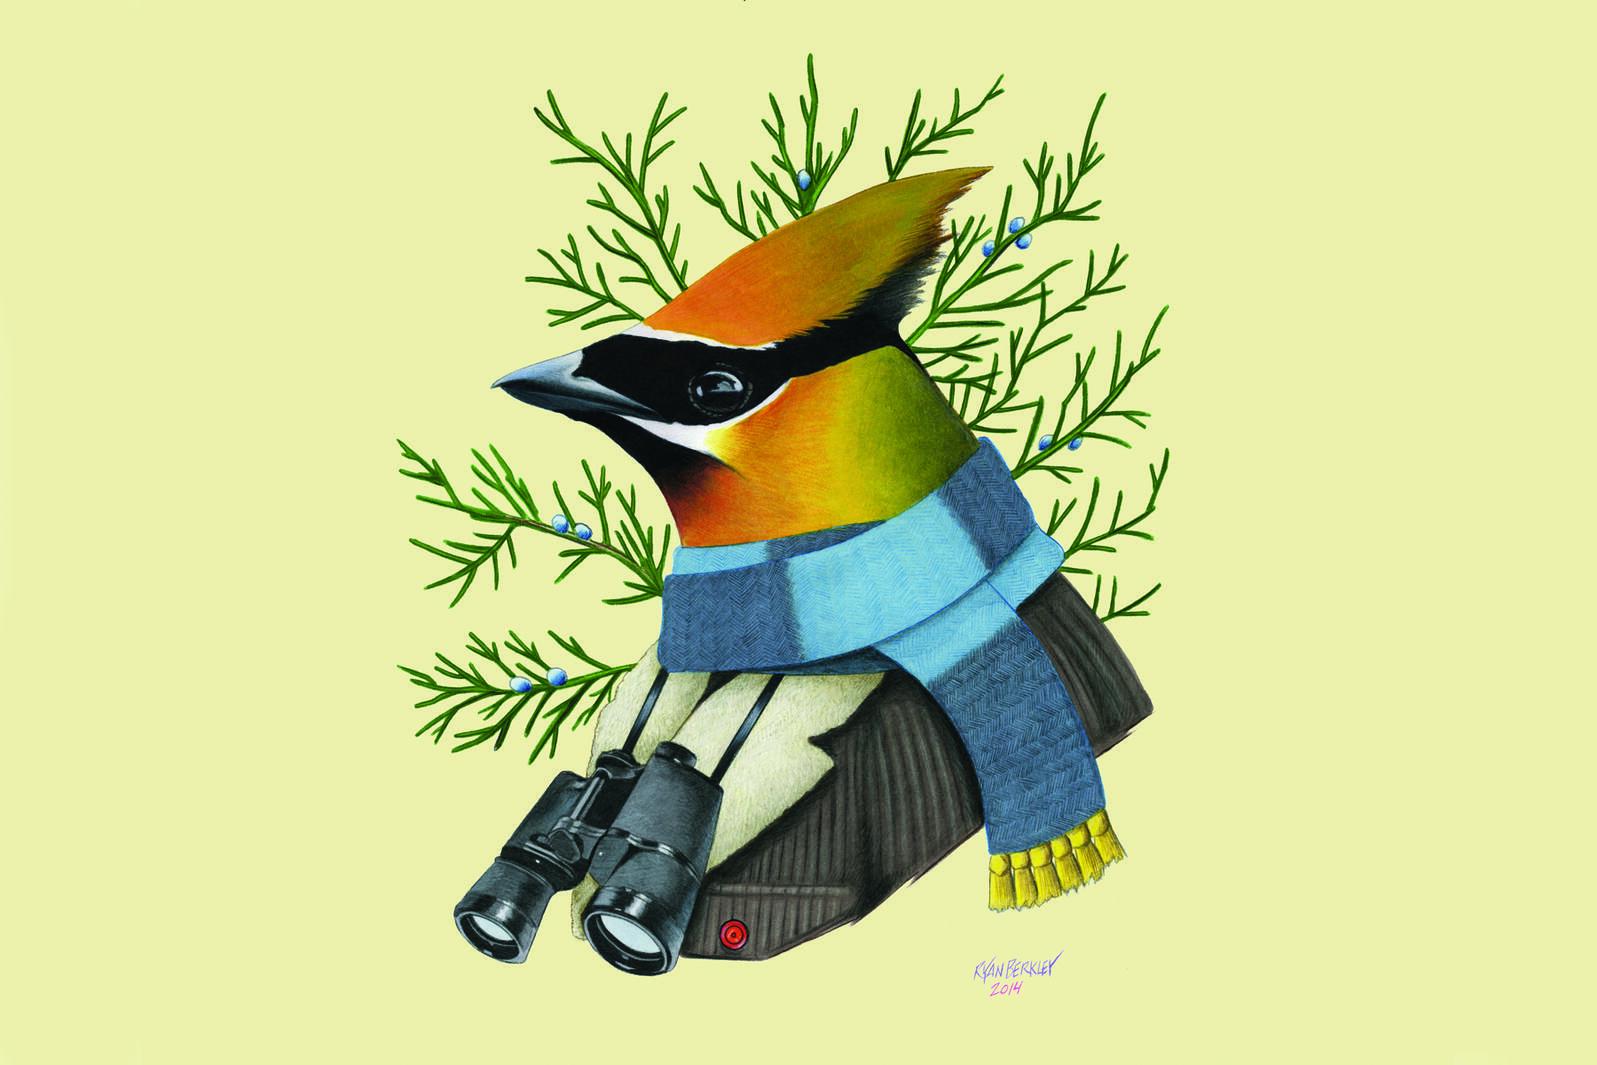 Illustration: Ryan Berkley